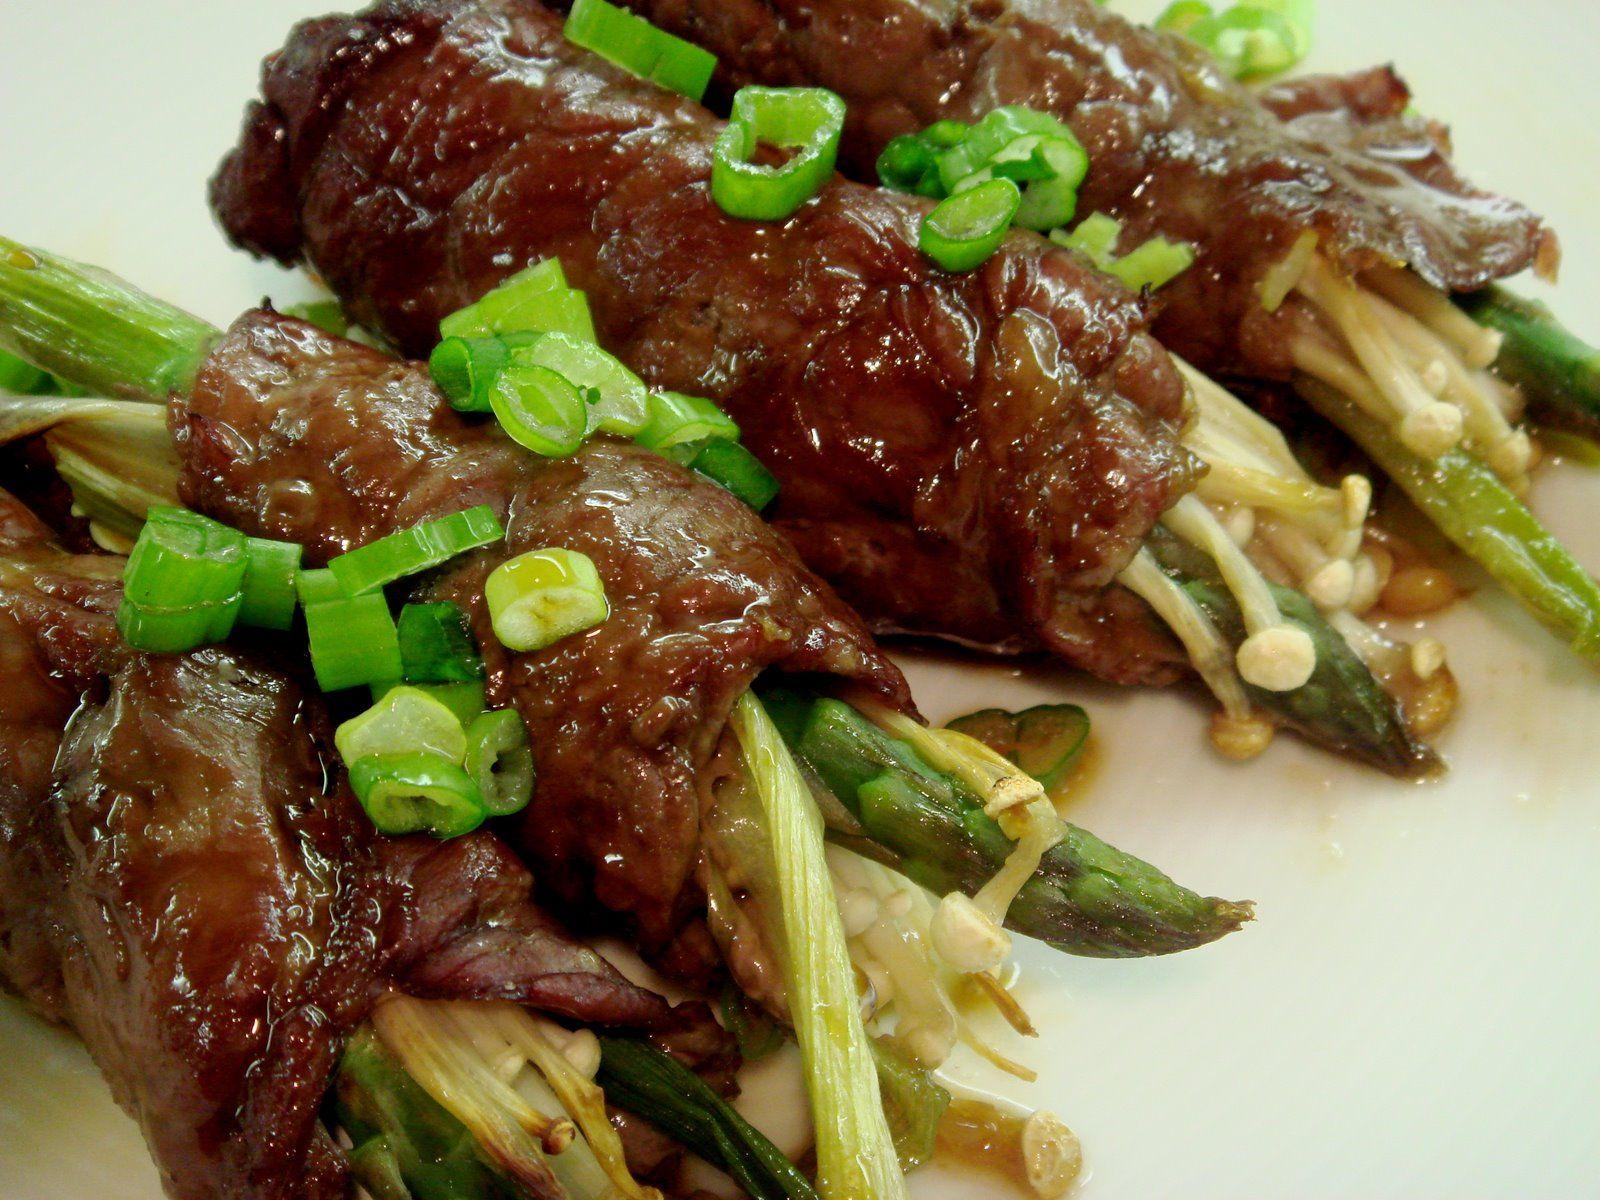 Japanese beef rolls recipe ingredients sirloin steaks japanese beef rolls recipe ingredients sirloin steaks asparagus green onion teriyaki forumfinder Image collections